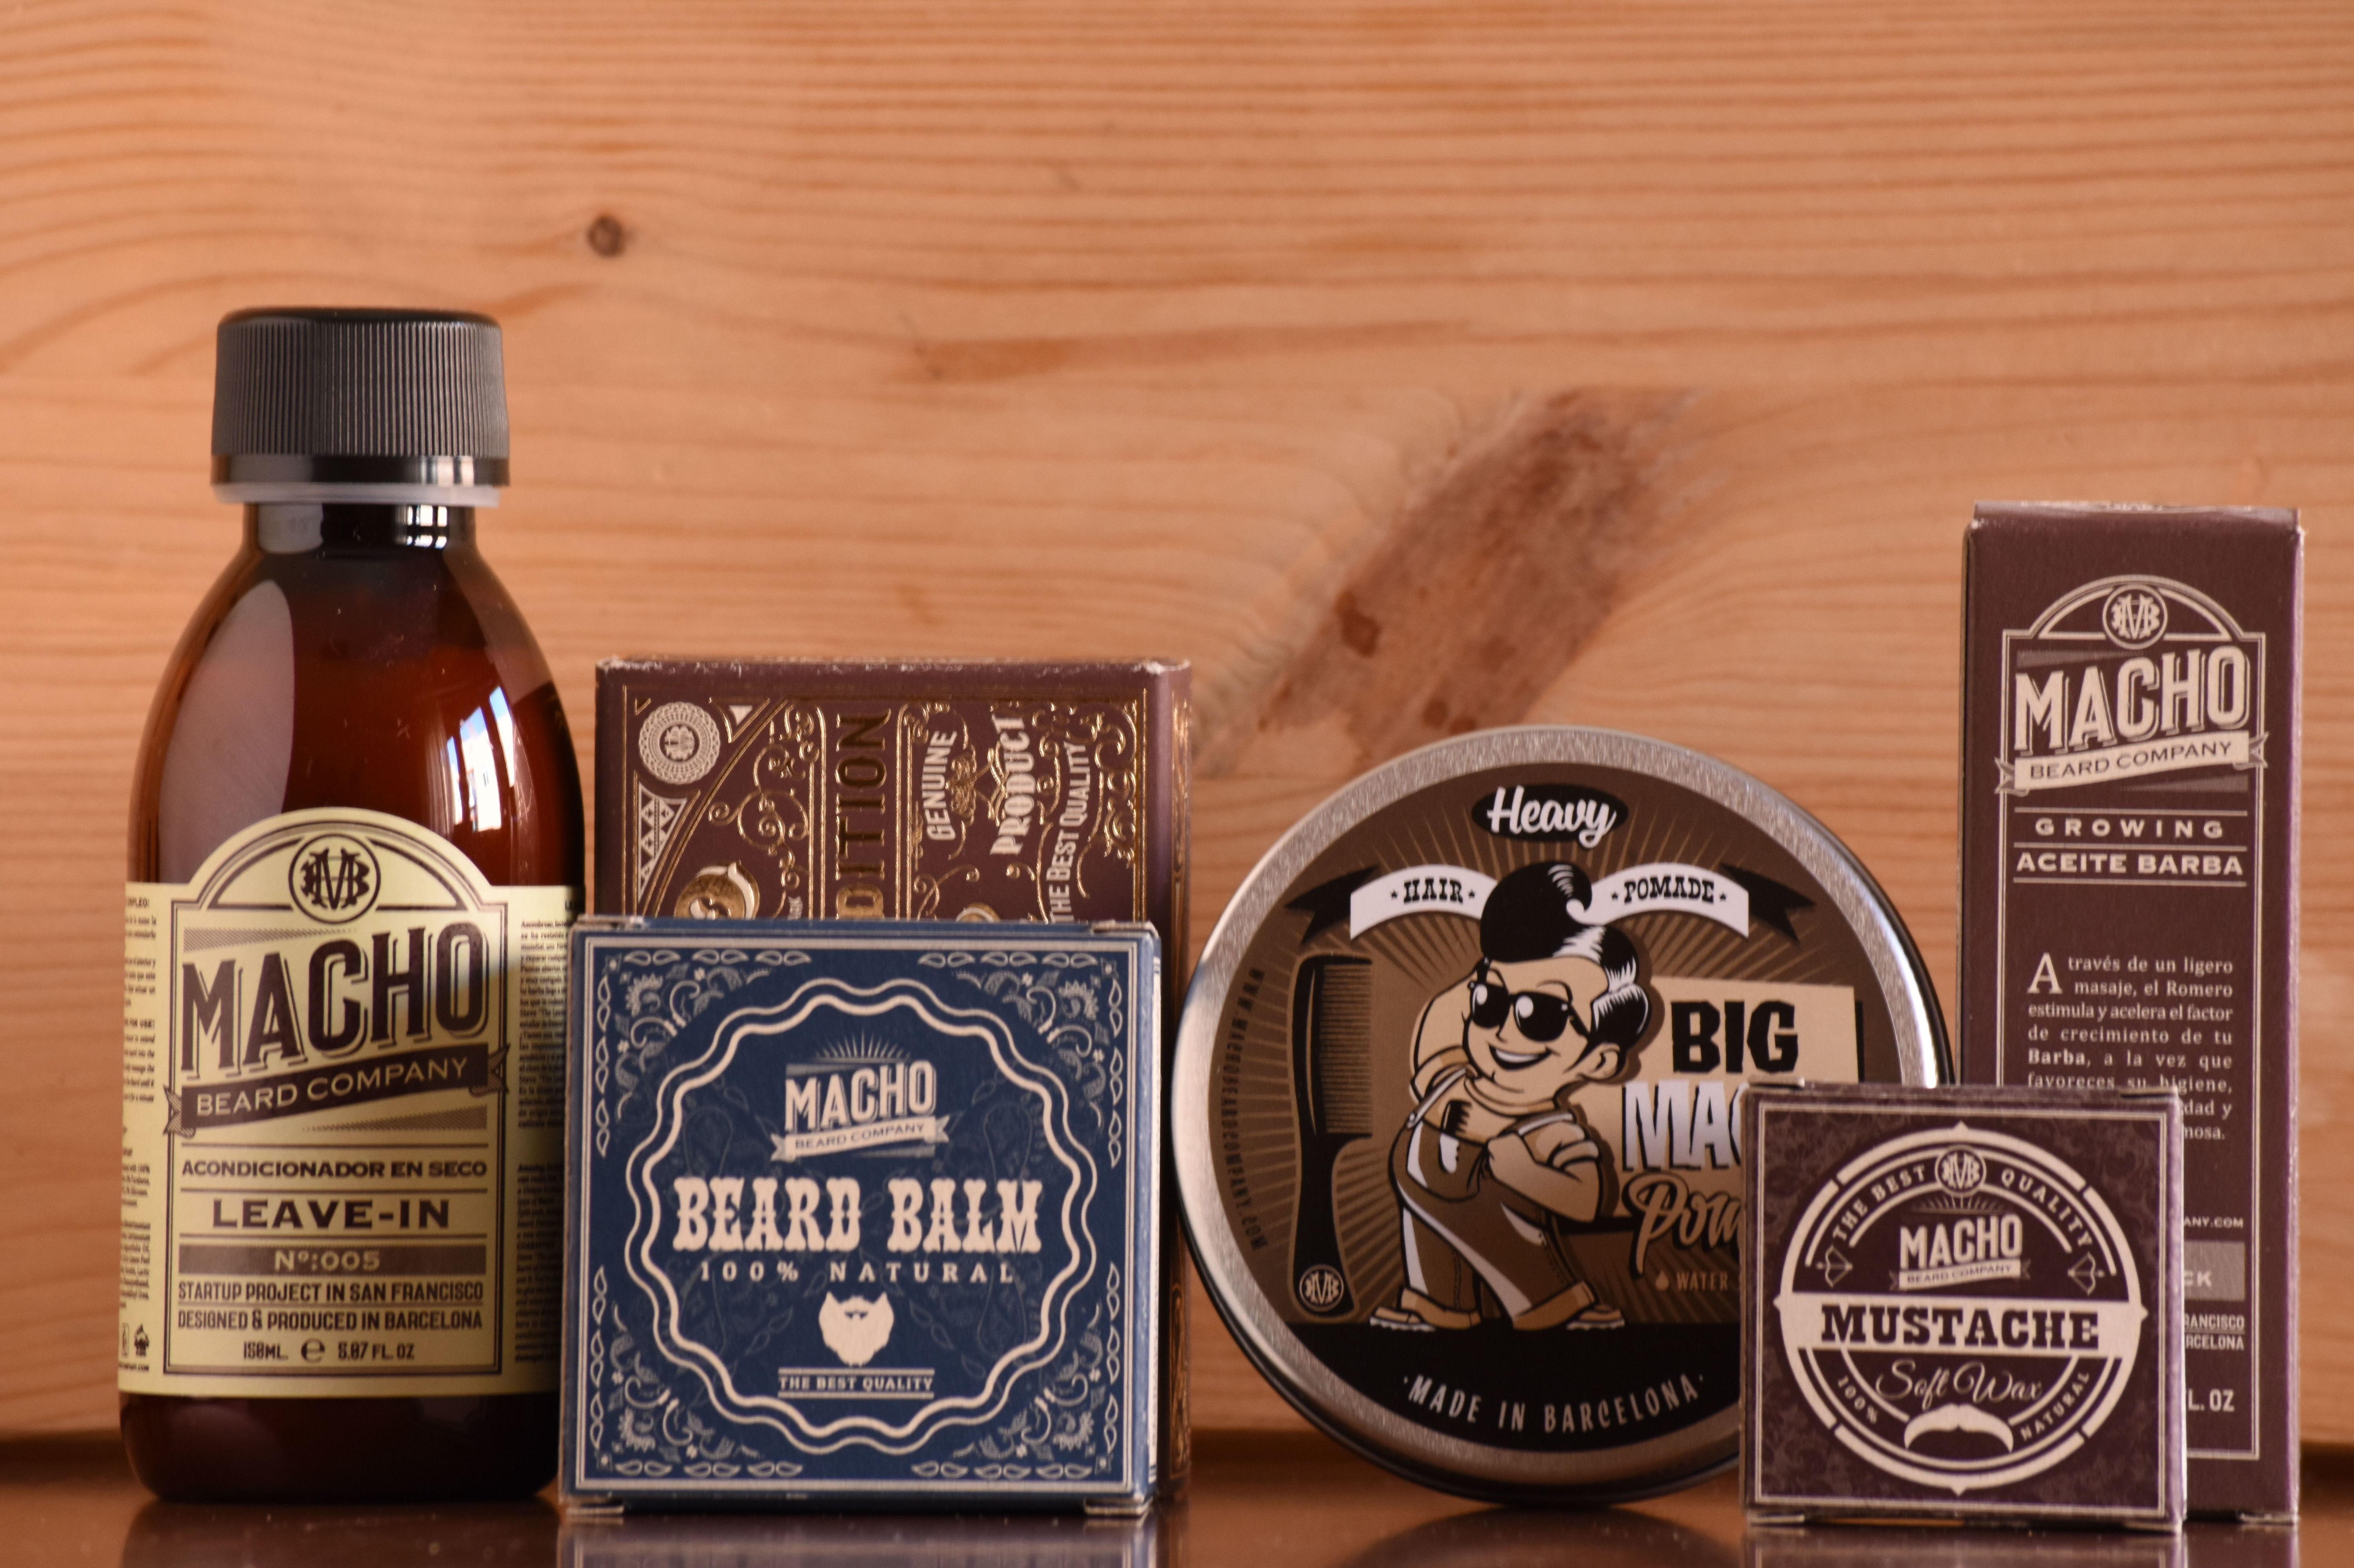 Macho Beard Company: Catálogo de Barbería GyC